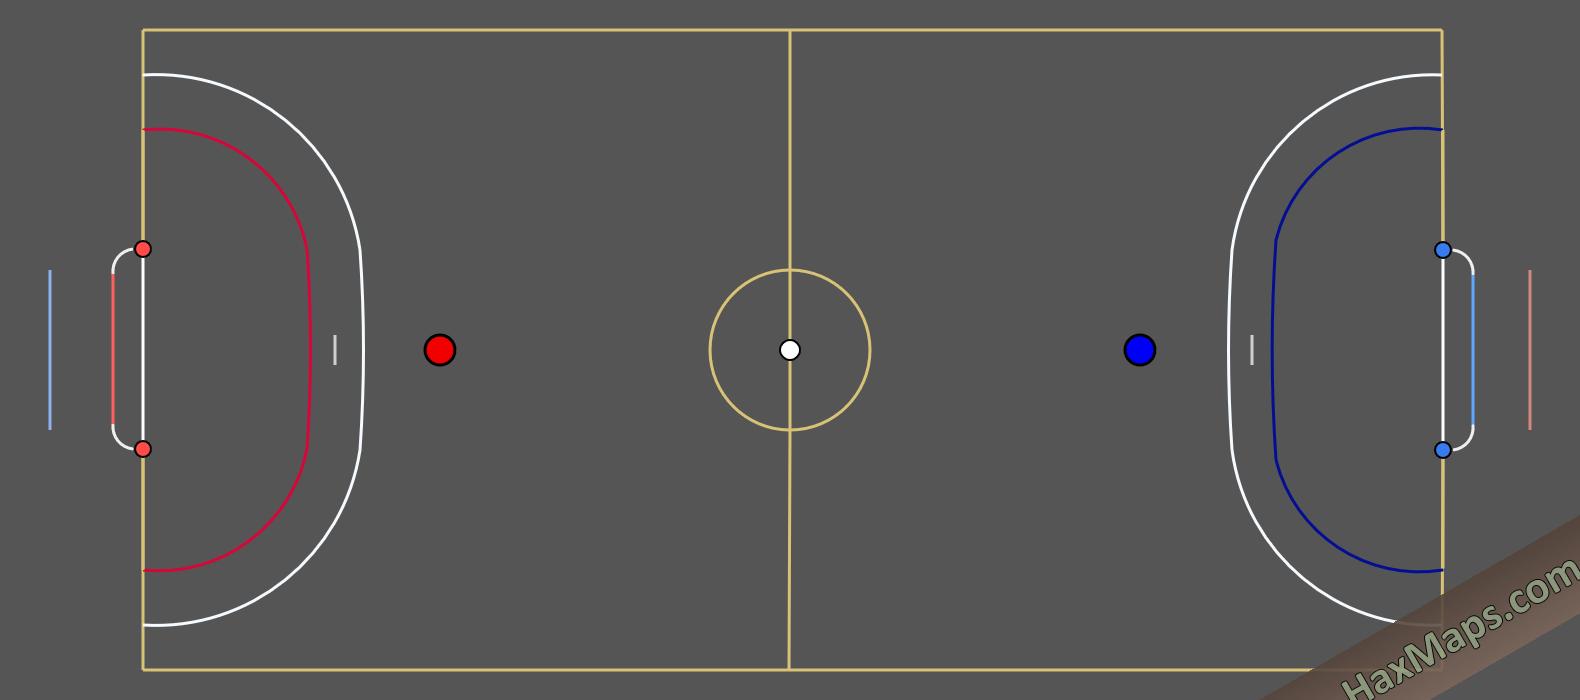 hax ball maps | Handball by HaxBall White Night